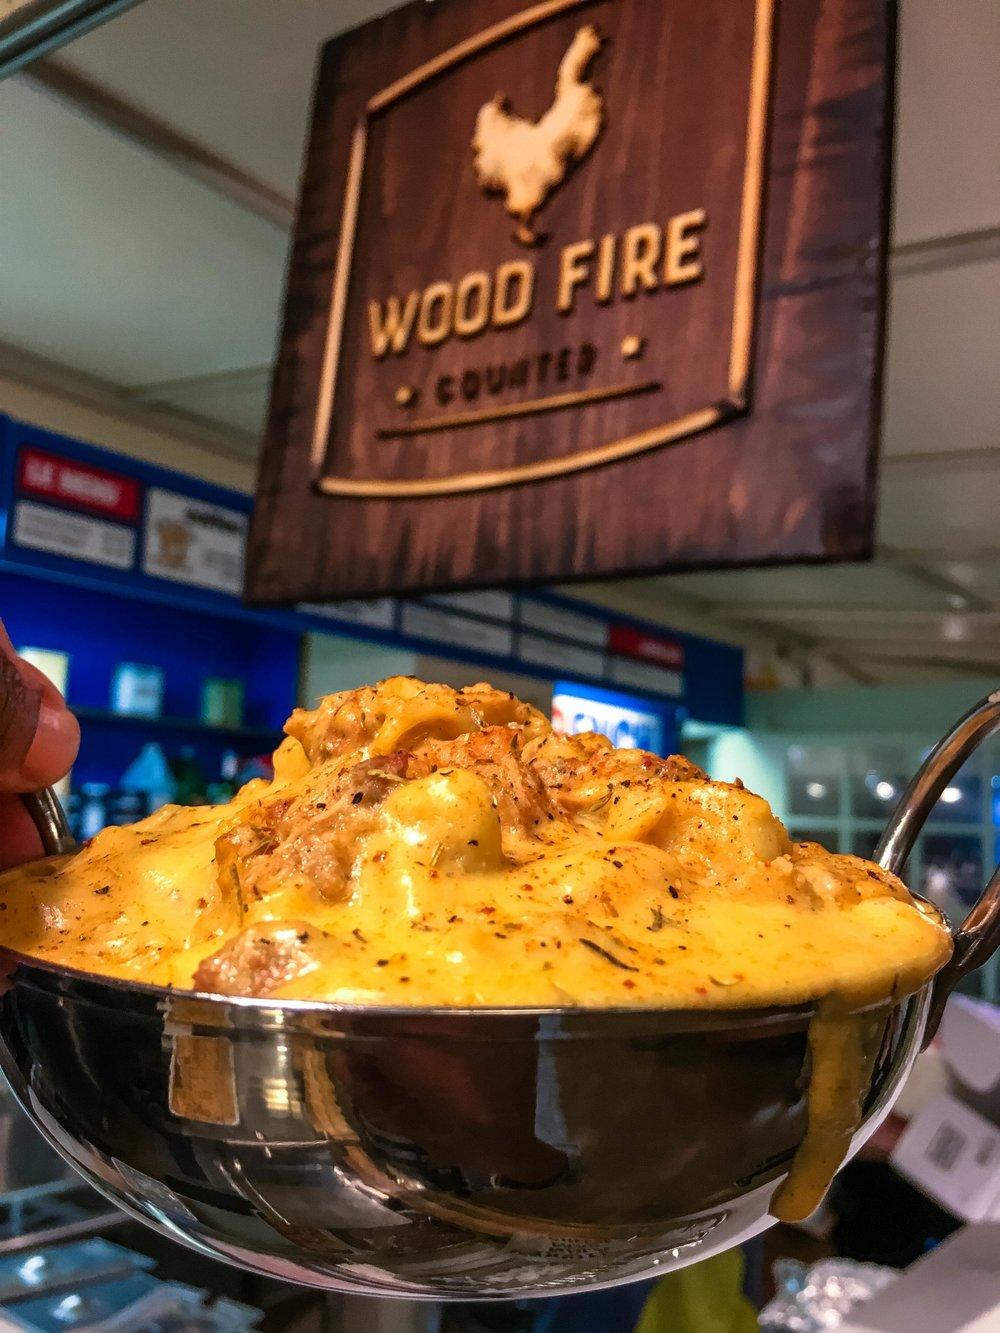 Wood Fire Counter's Gumbo Mac N Cheese